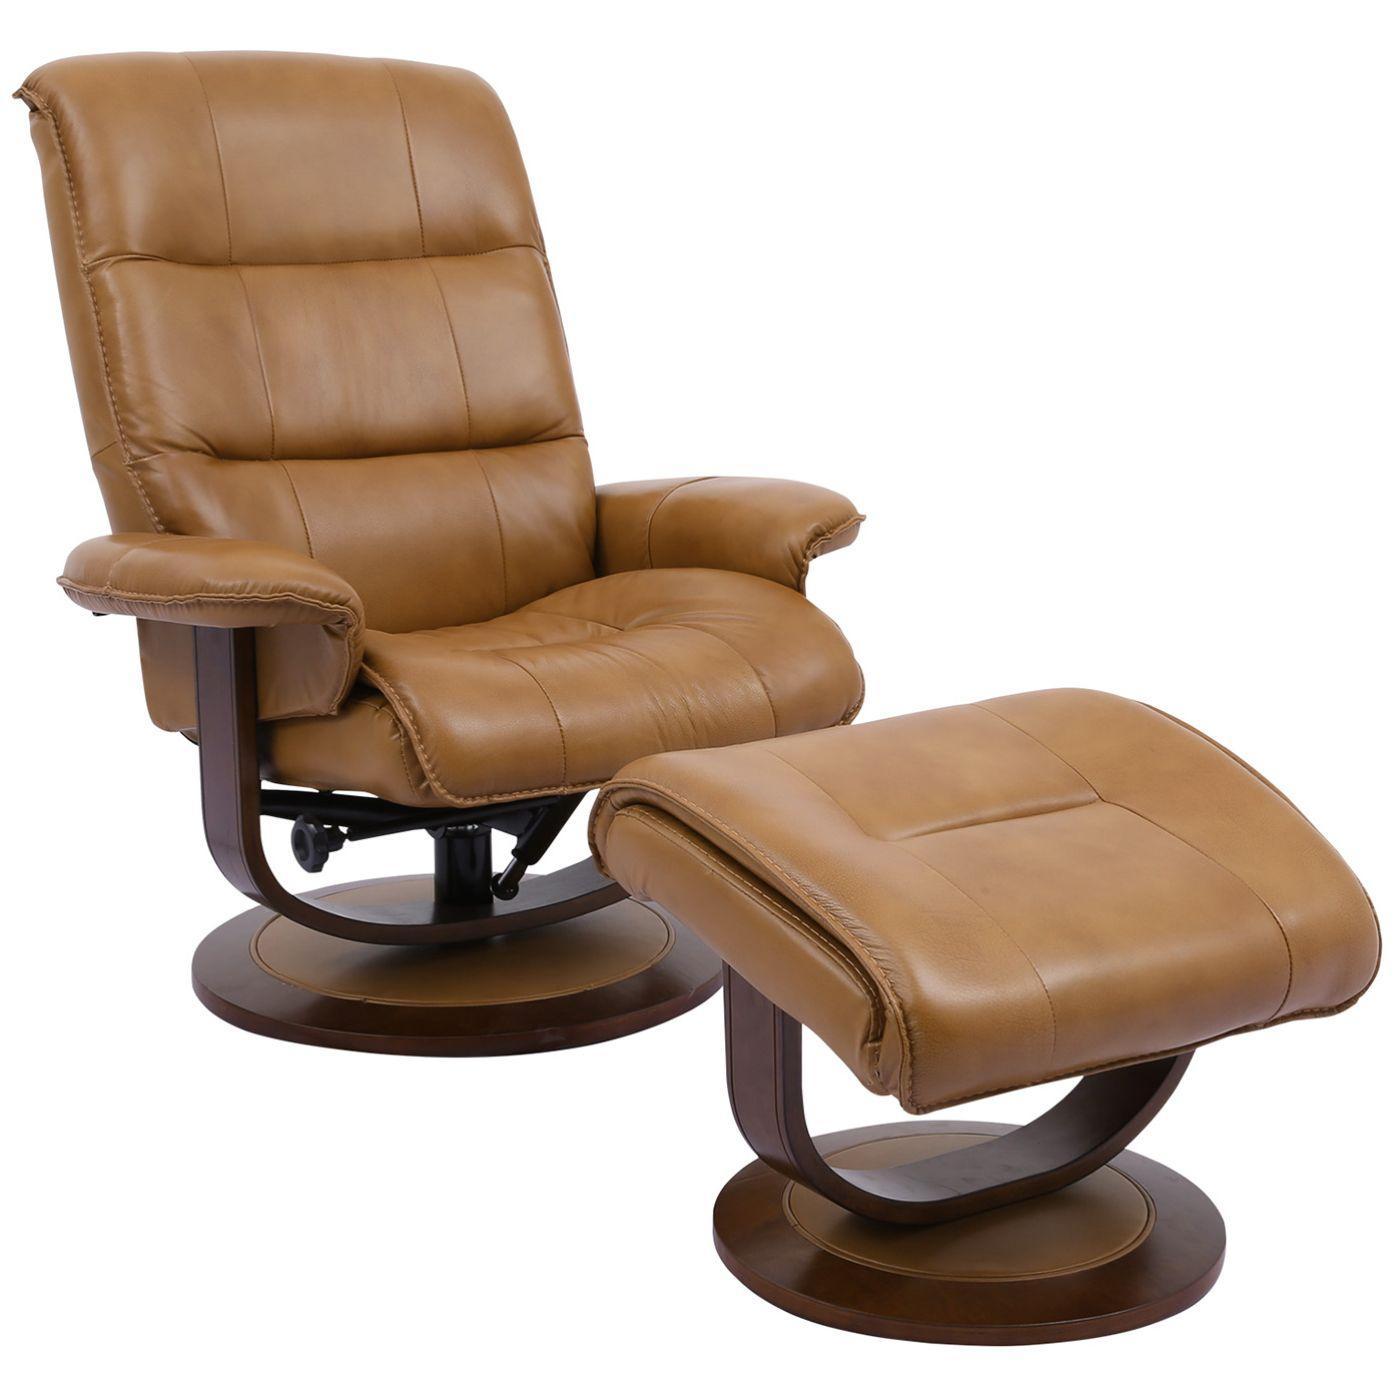 Parker House Mkni 212s But Knight Manual Reclining Swivel Chair Ottoman Caramel Brown Top Grain Leather Recliner With Ottoman Swivel Recliner Swivel Recliner Chairs Leather swivel recliner with ottoman